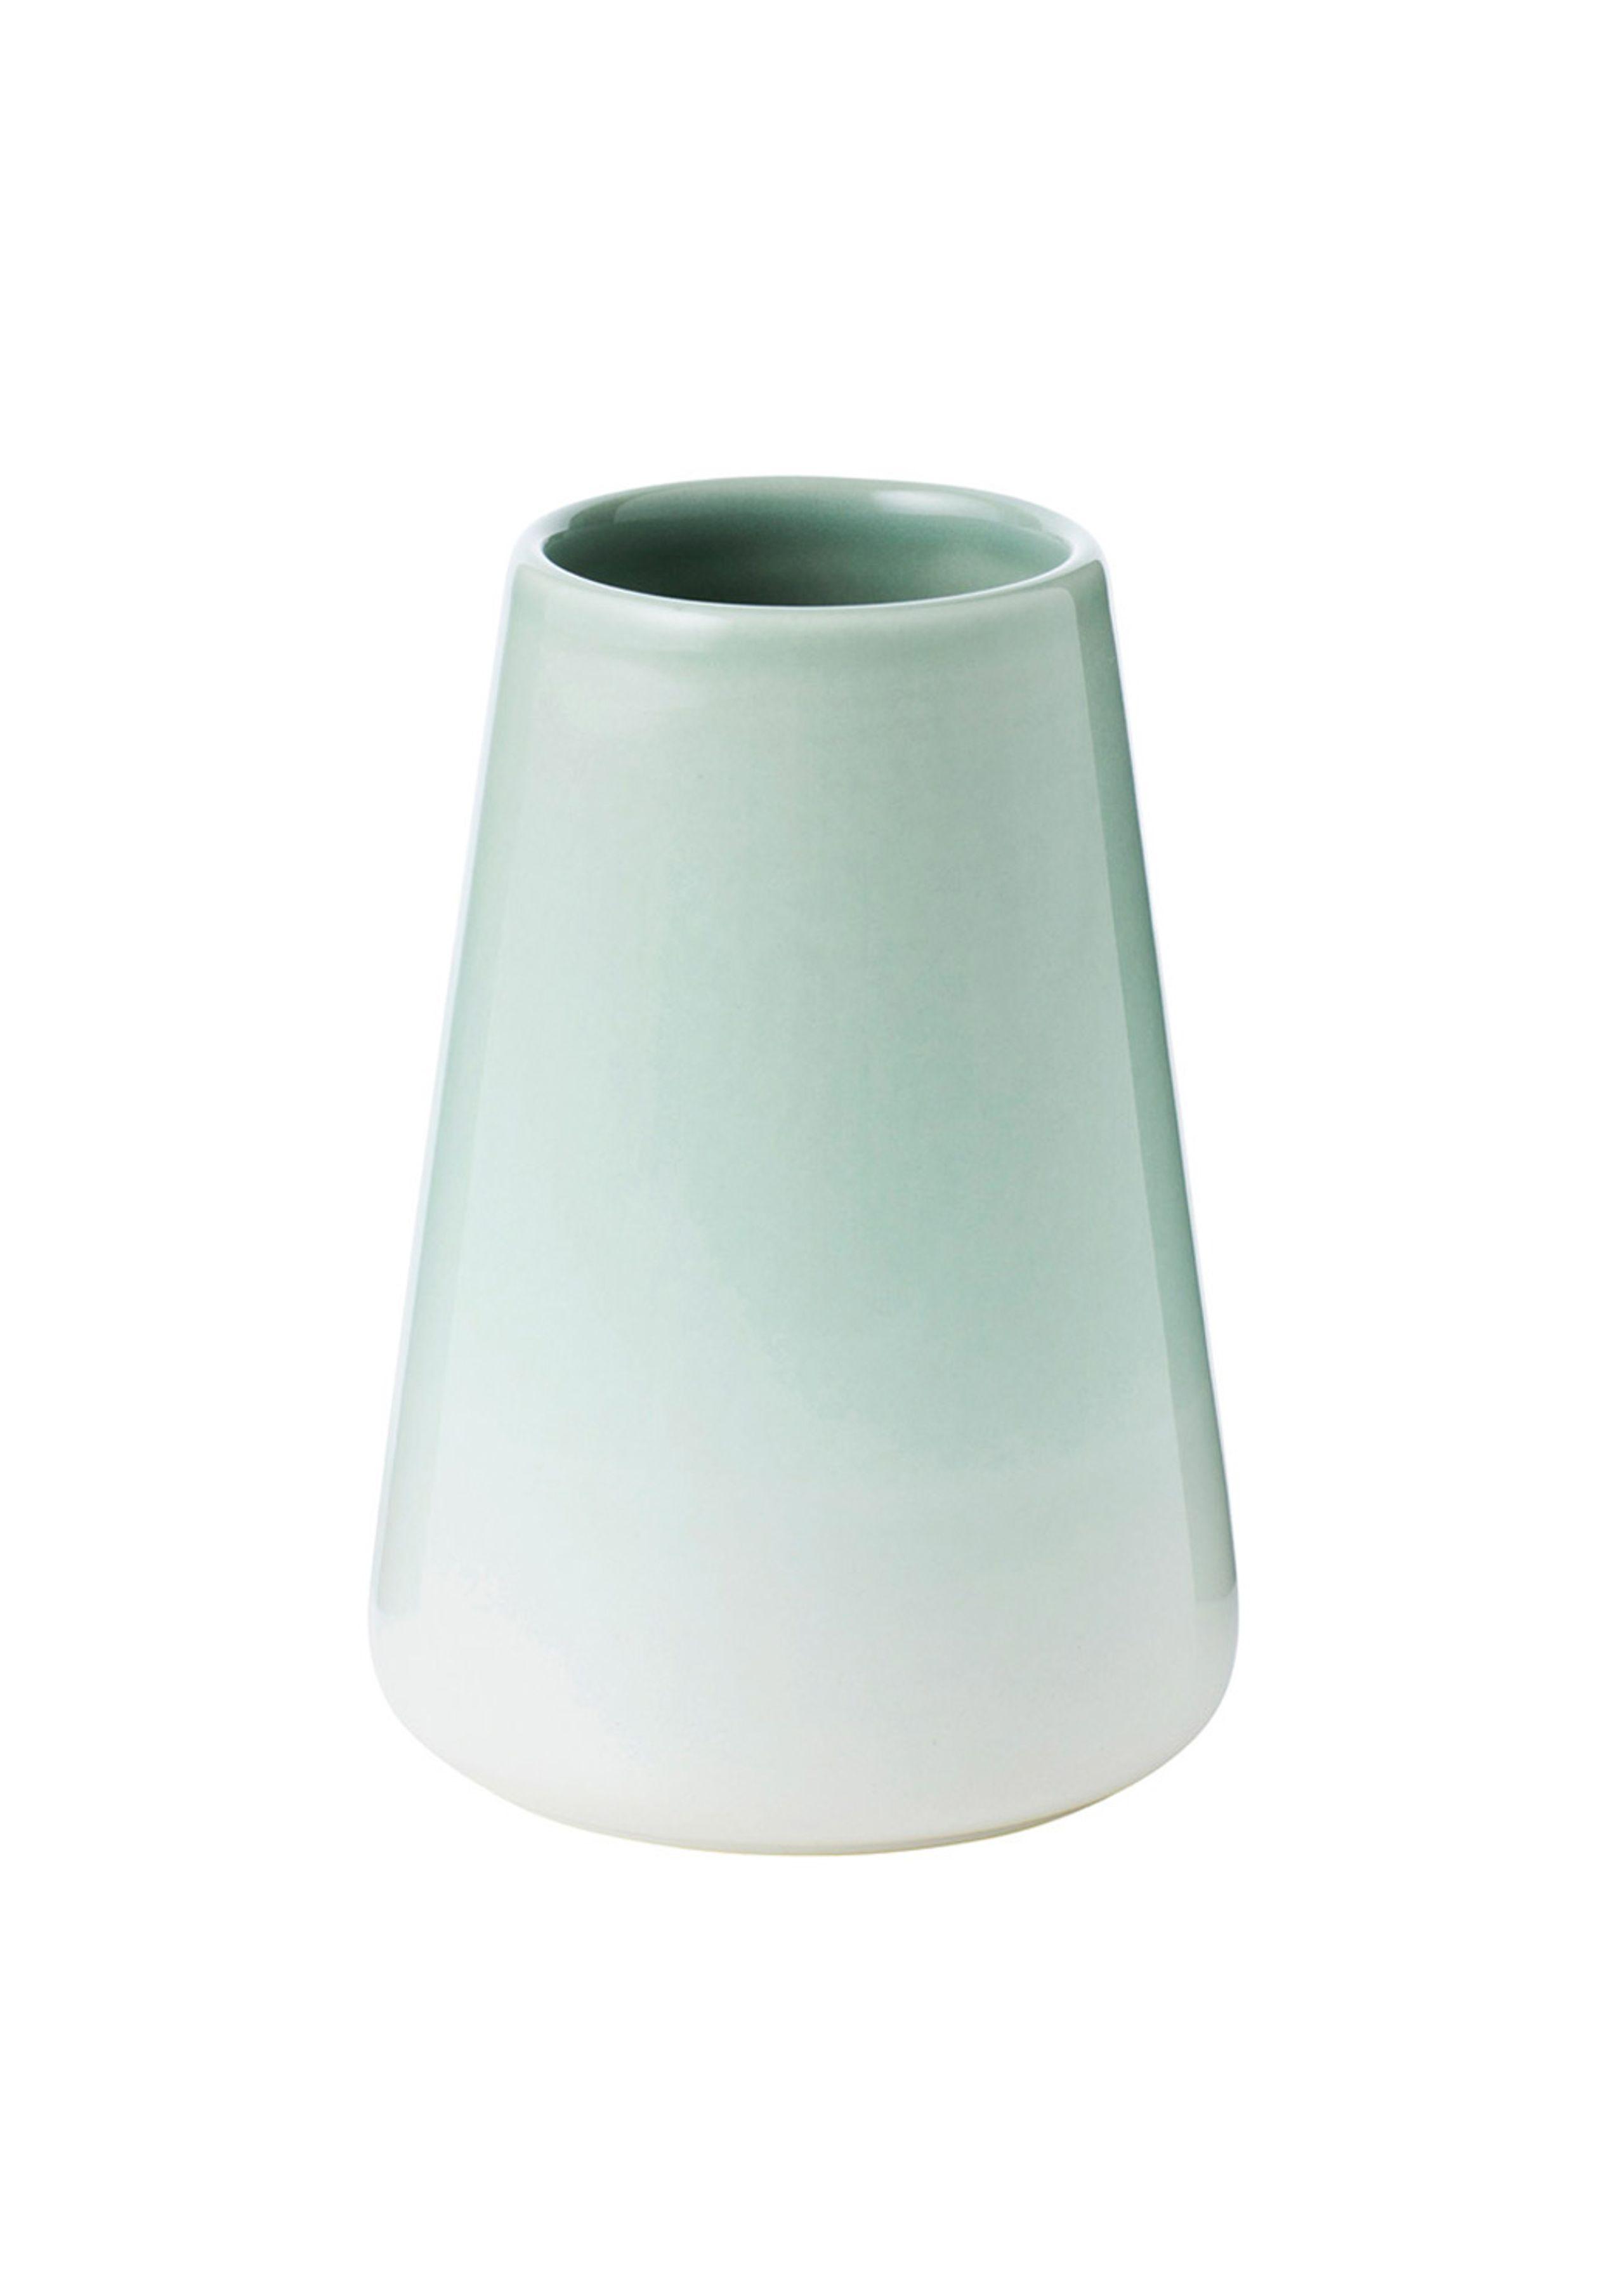 Nuvola vase small